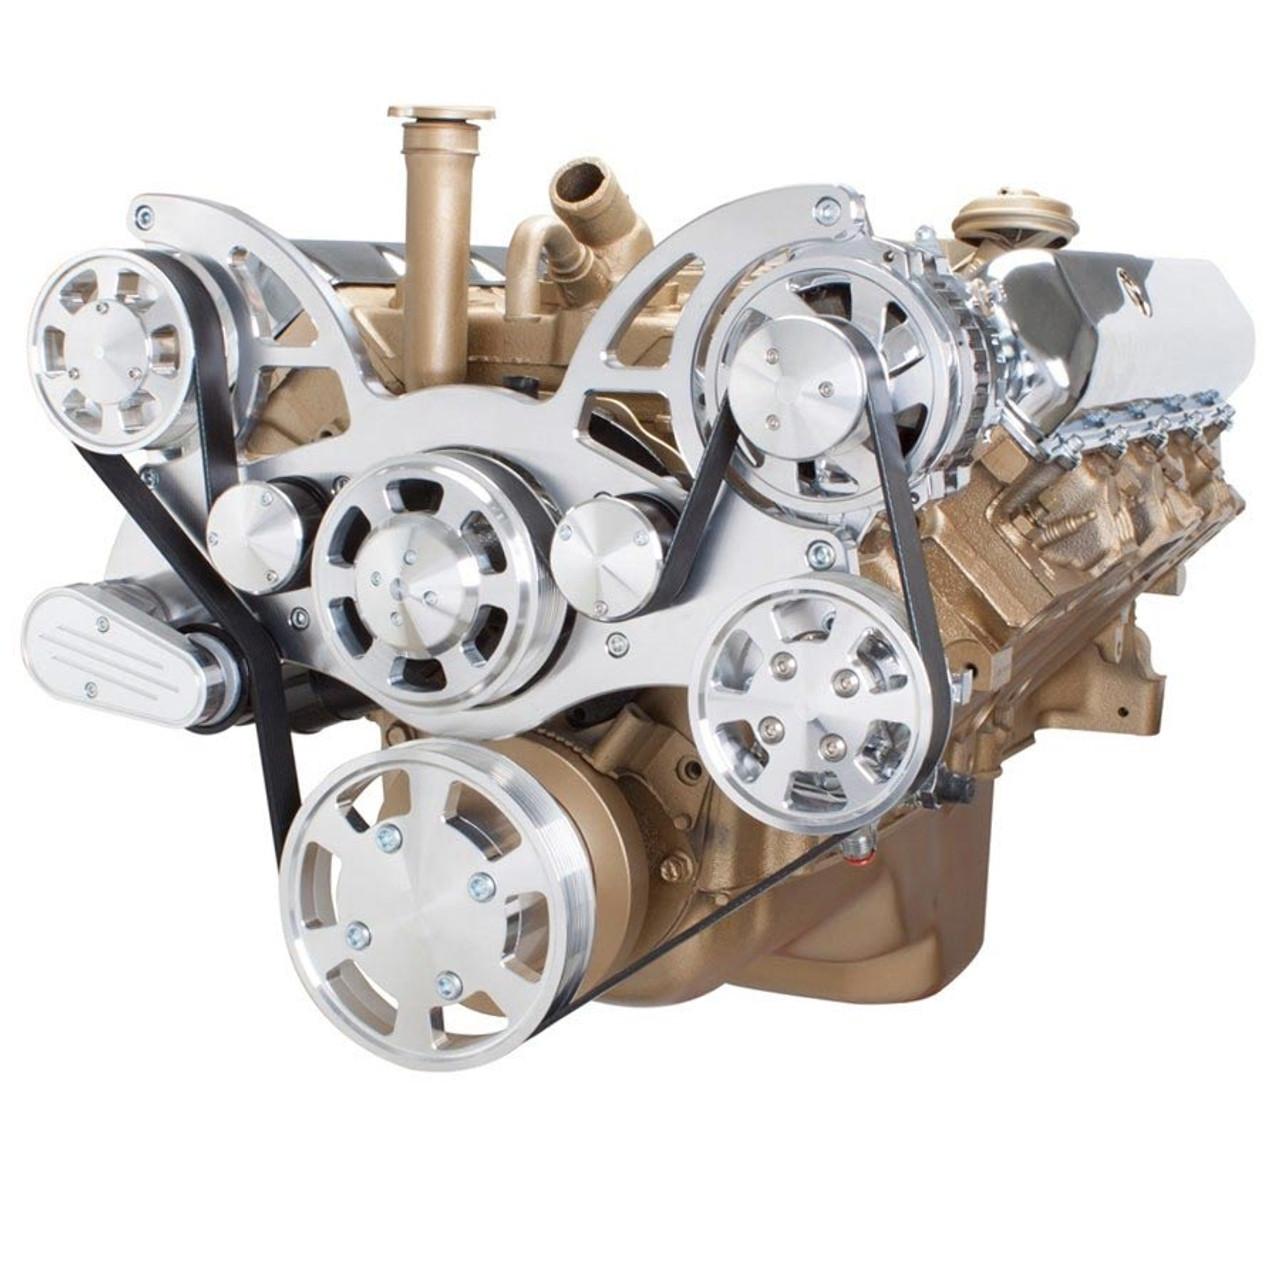 small resolution of serpentine system for oldsmobile 350 455 power steering alternator